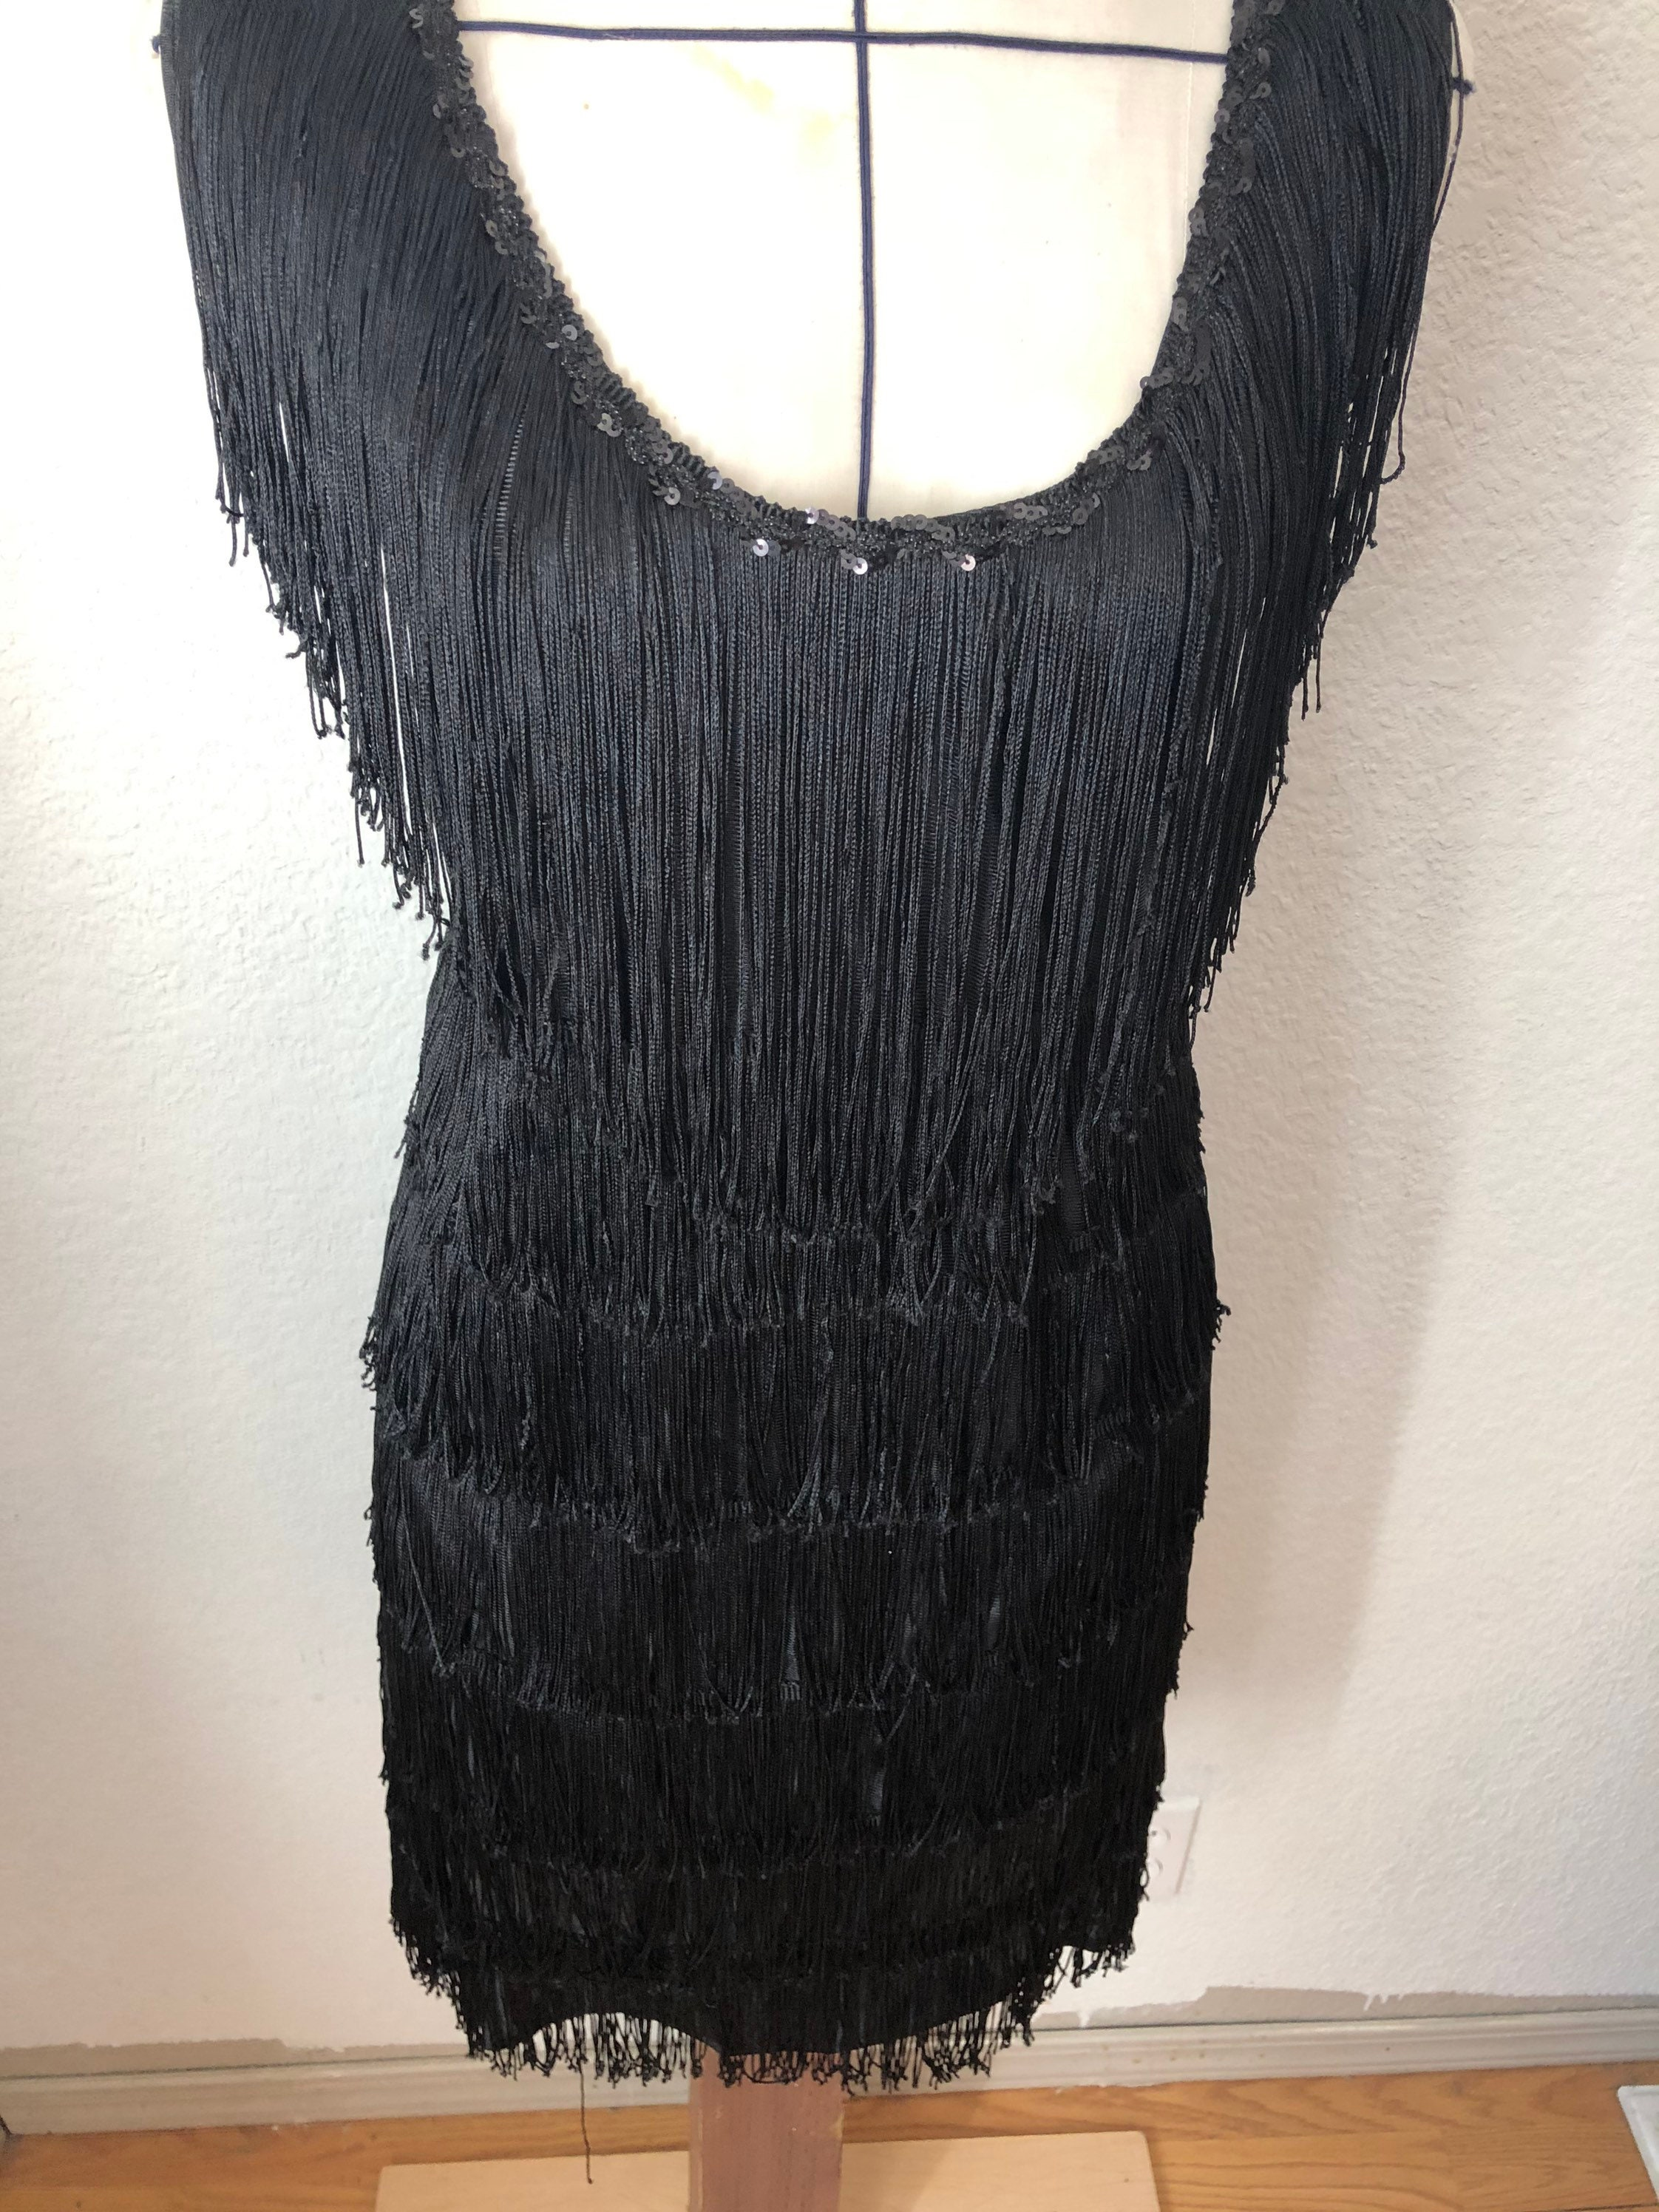 80s Dresses | Casual to Party Dresses 1970A Xl Fringe Dress. Black. Nylon. 1920S Flapper Style $35.00 AT vintagedancer.com